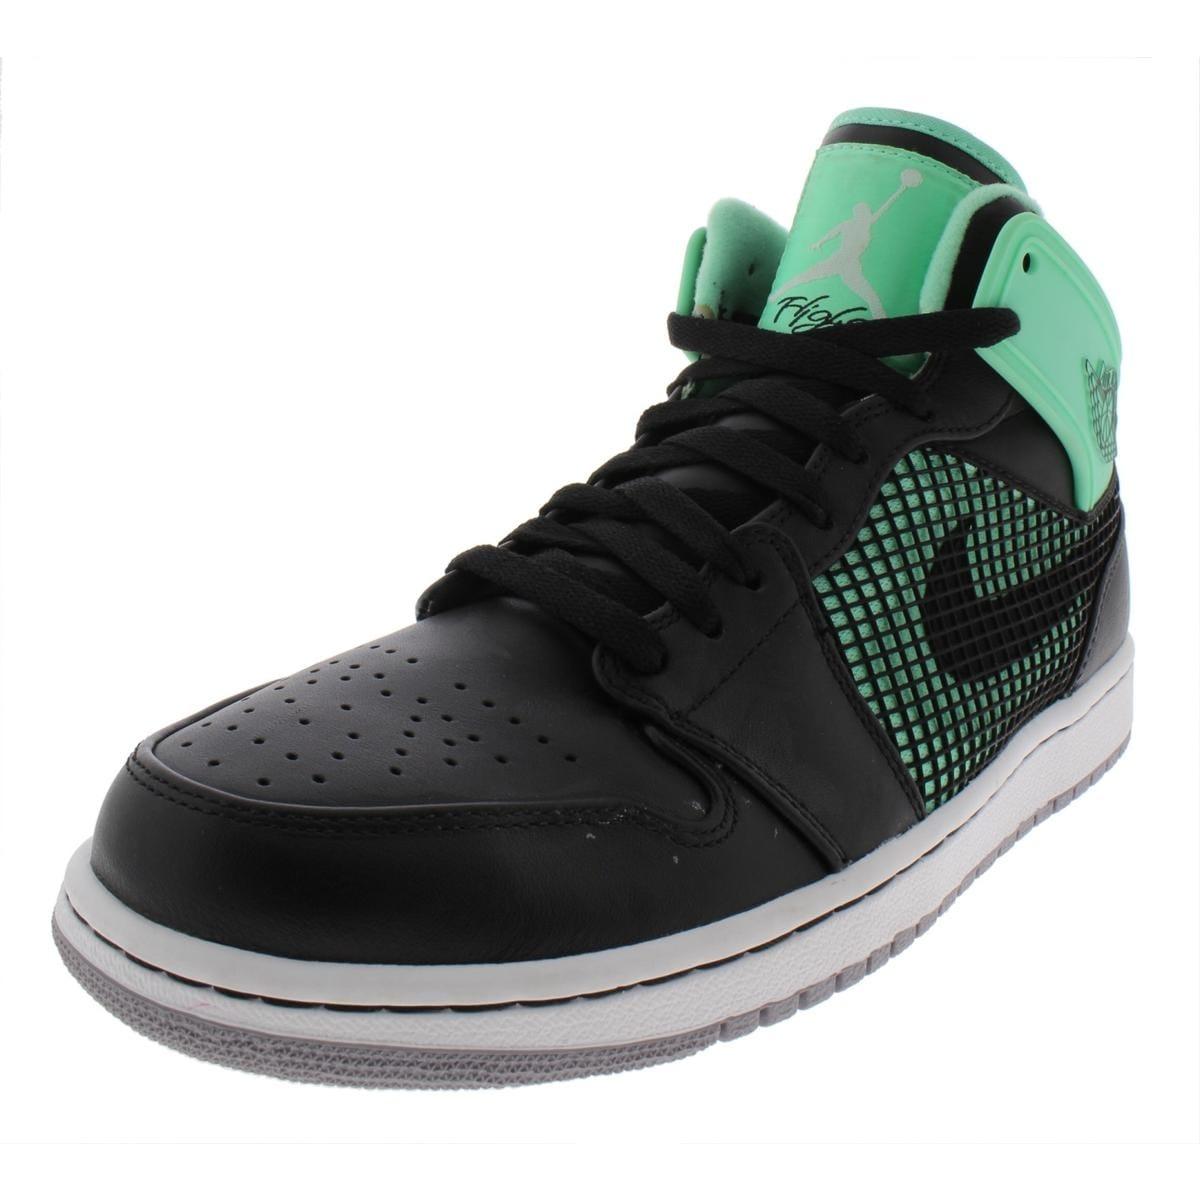 pretty nice 8561e 679e7 Nike Mens Air Jordan 1 Retro '89 Basketball Shoes Leather Hightop